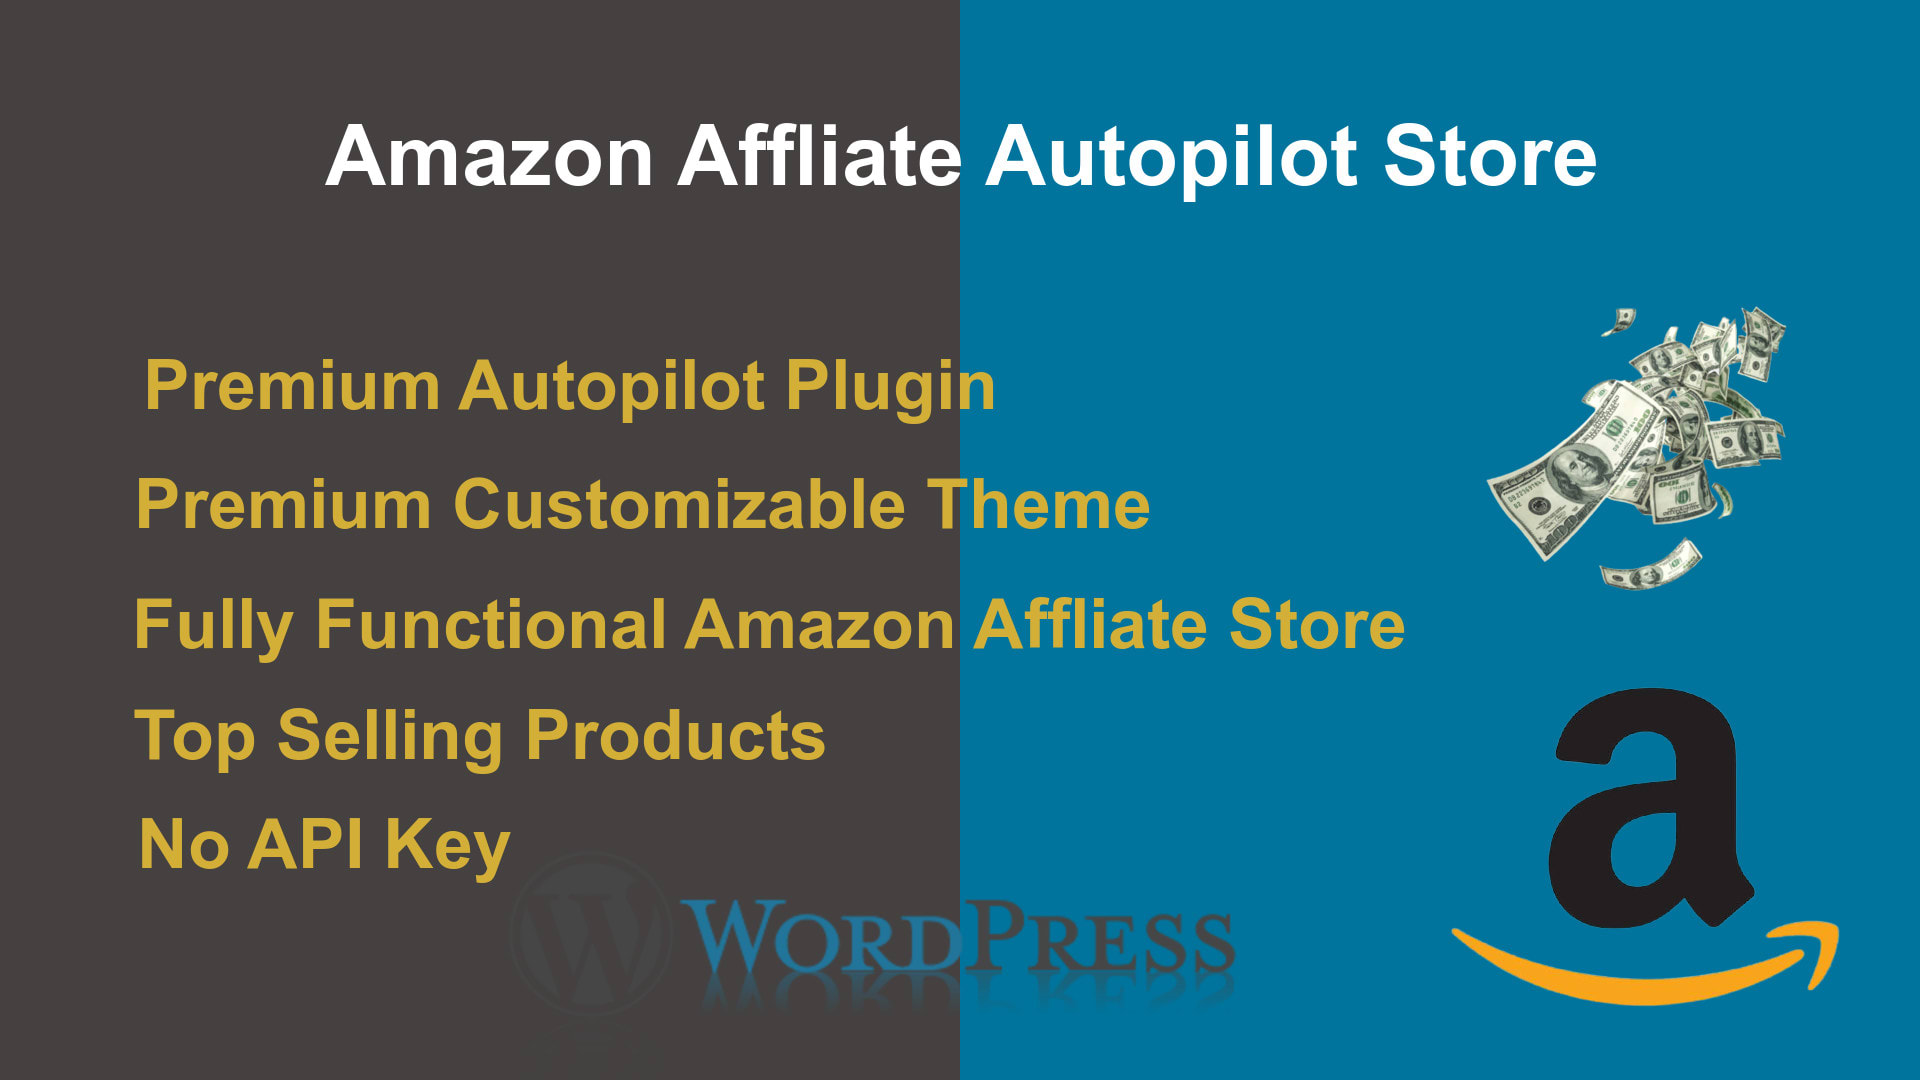 I will build amazon affliate autopilot store